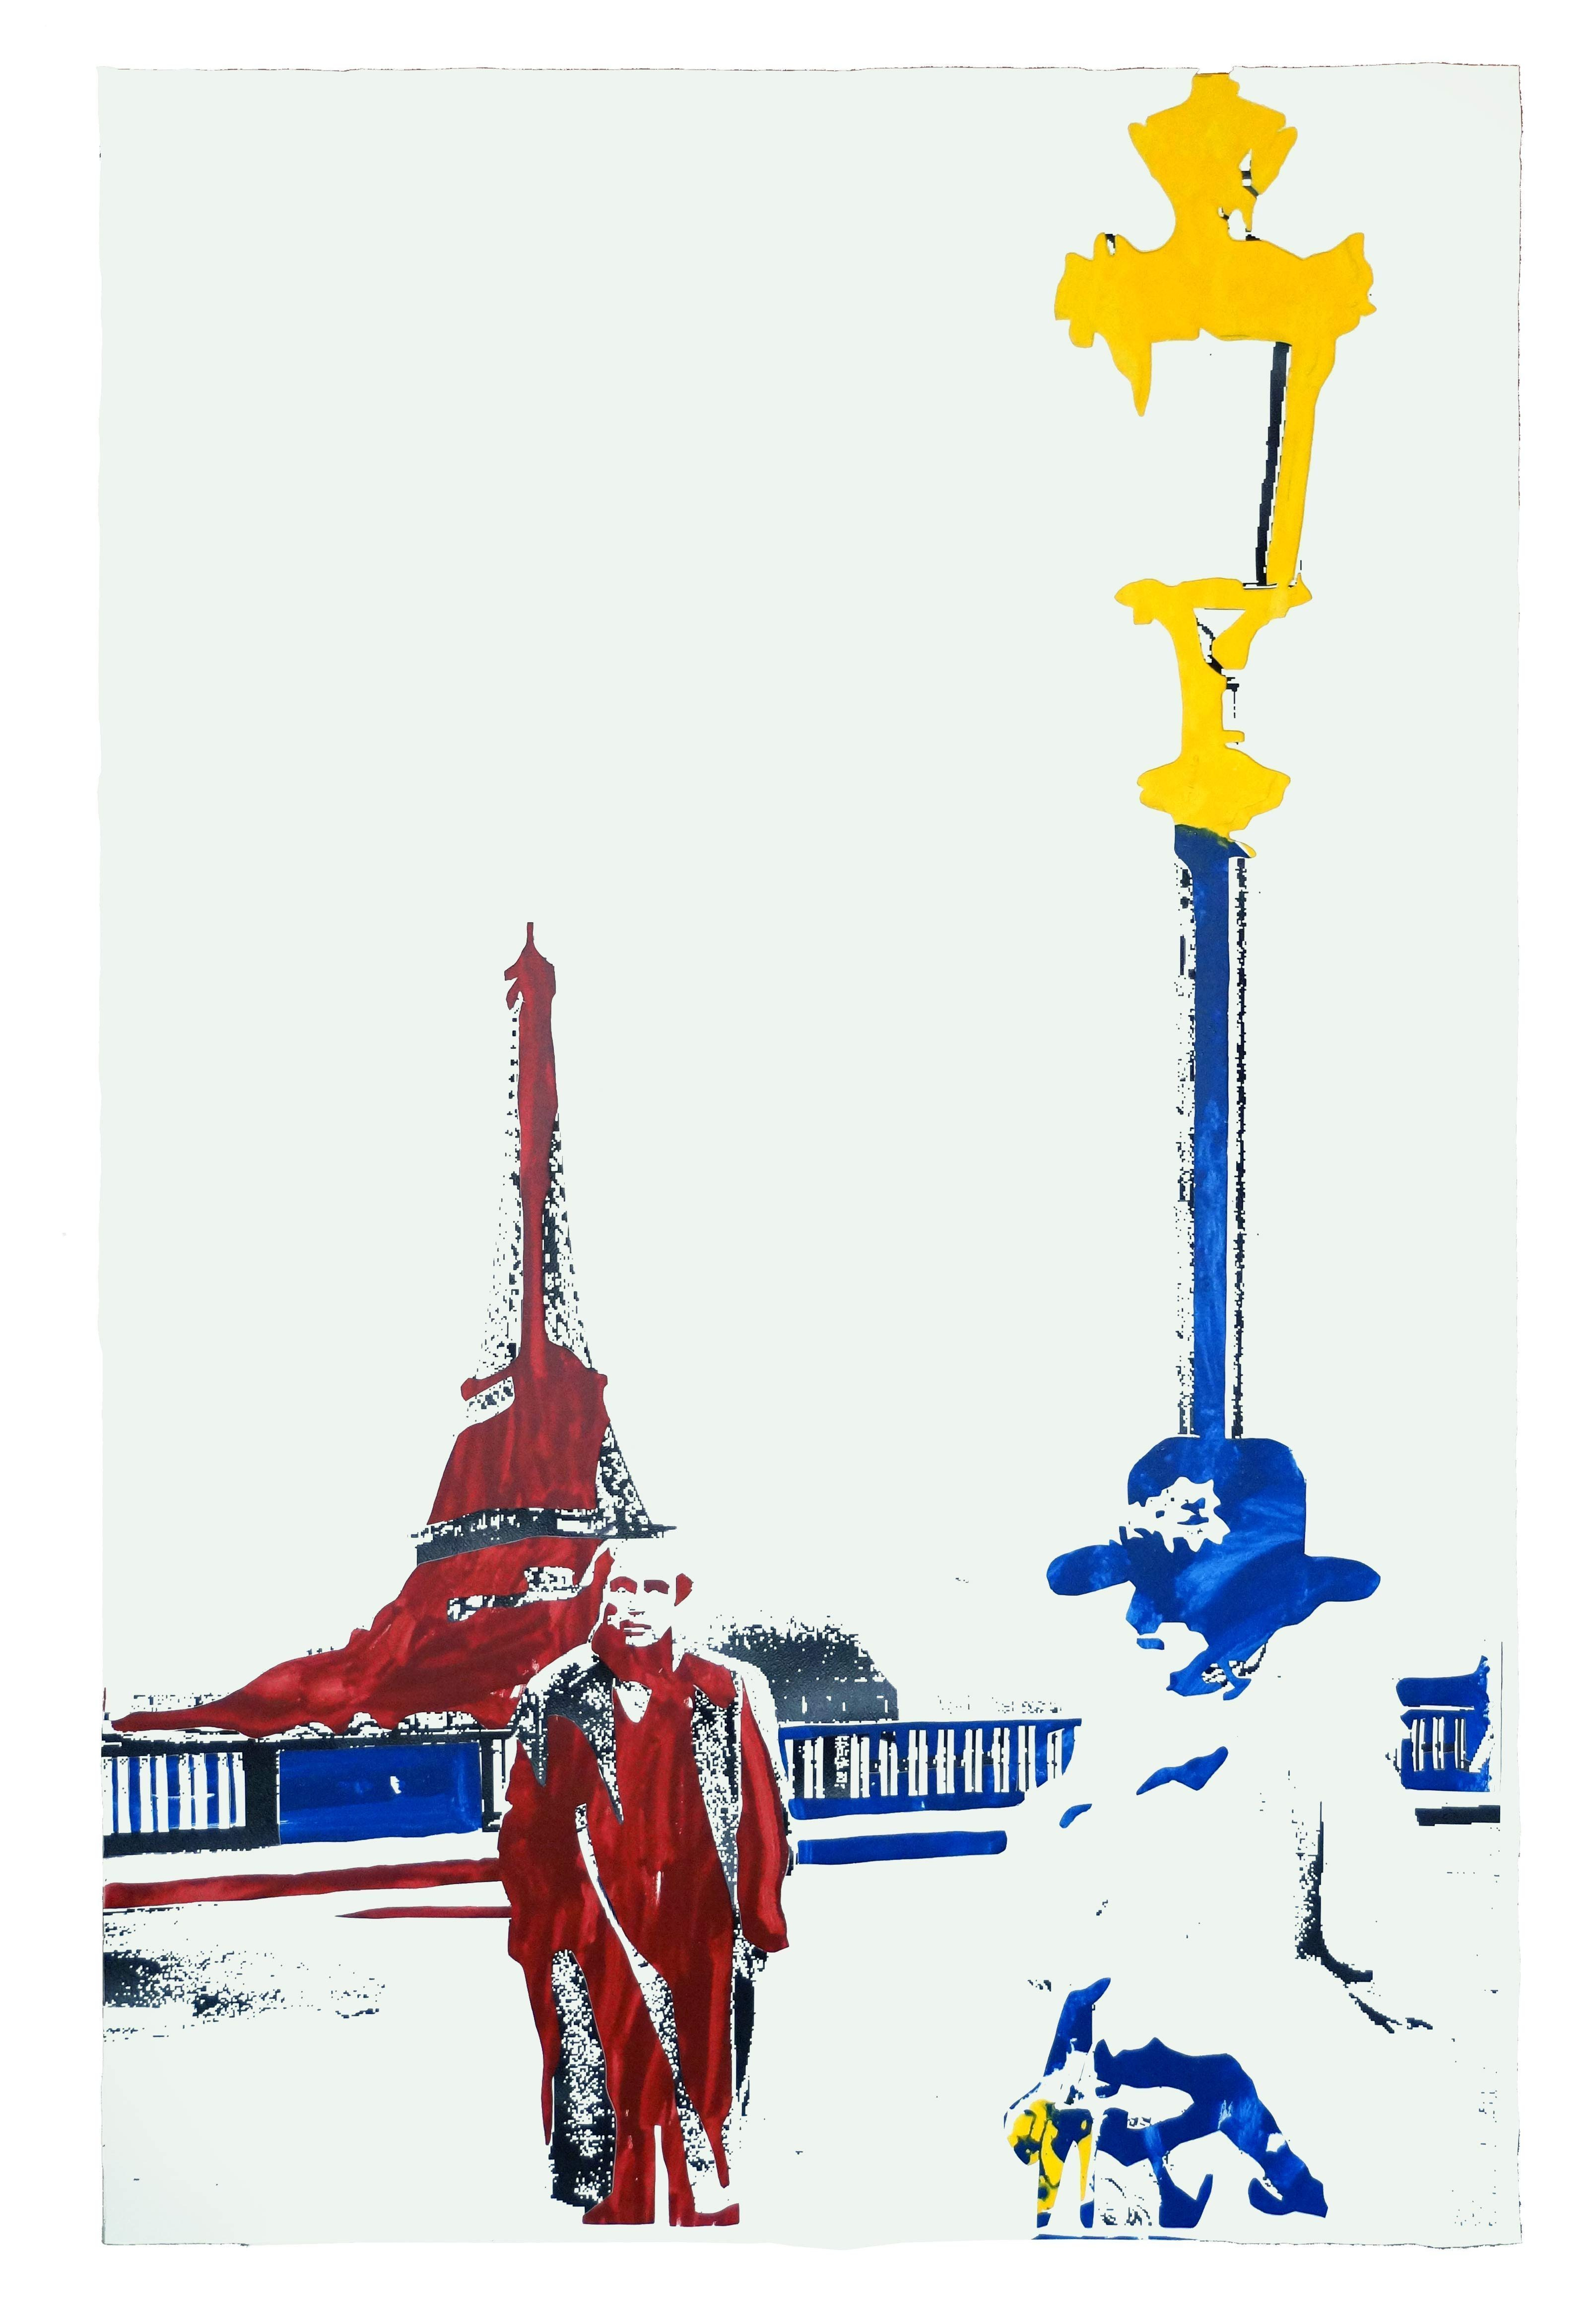 Manifesti - Ultimo tango a Parigi - tecn. mista su tela 170x130 - 2016